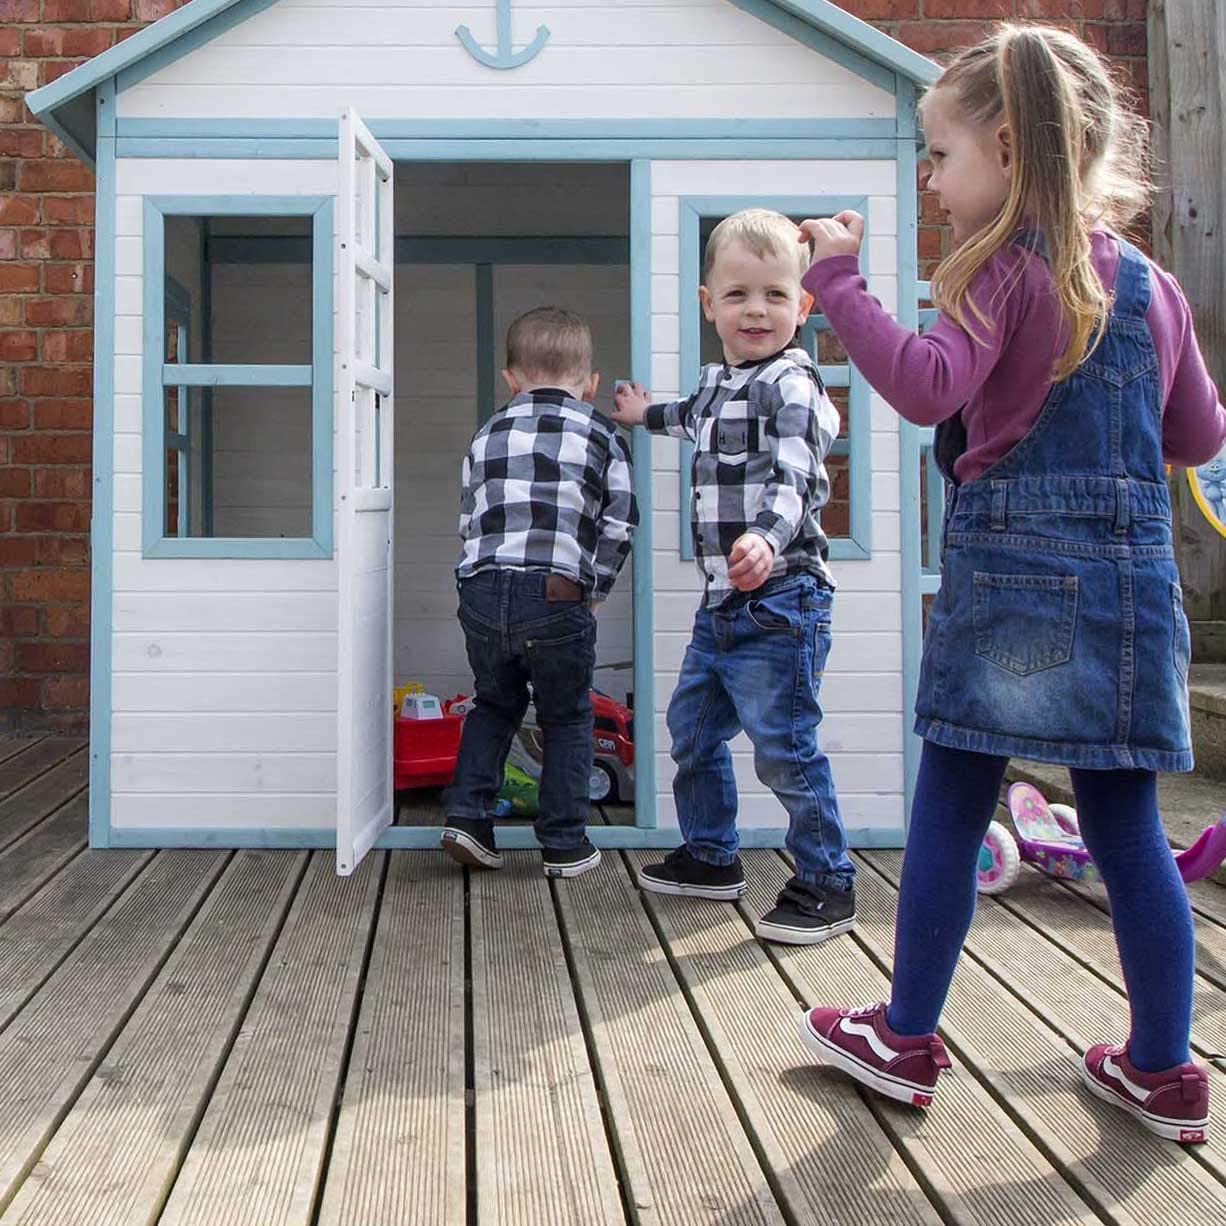 Airwave Childrens Painted Wooden Playhouse Large Kids Garden Outdoor Play Beach